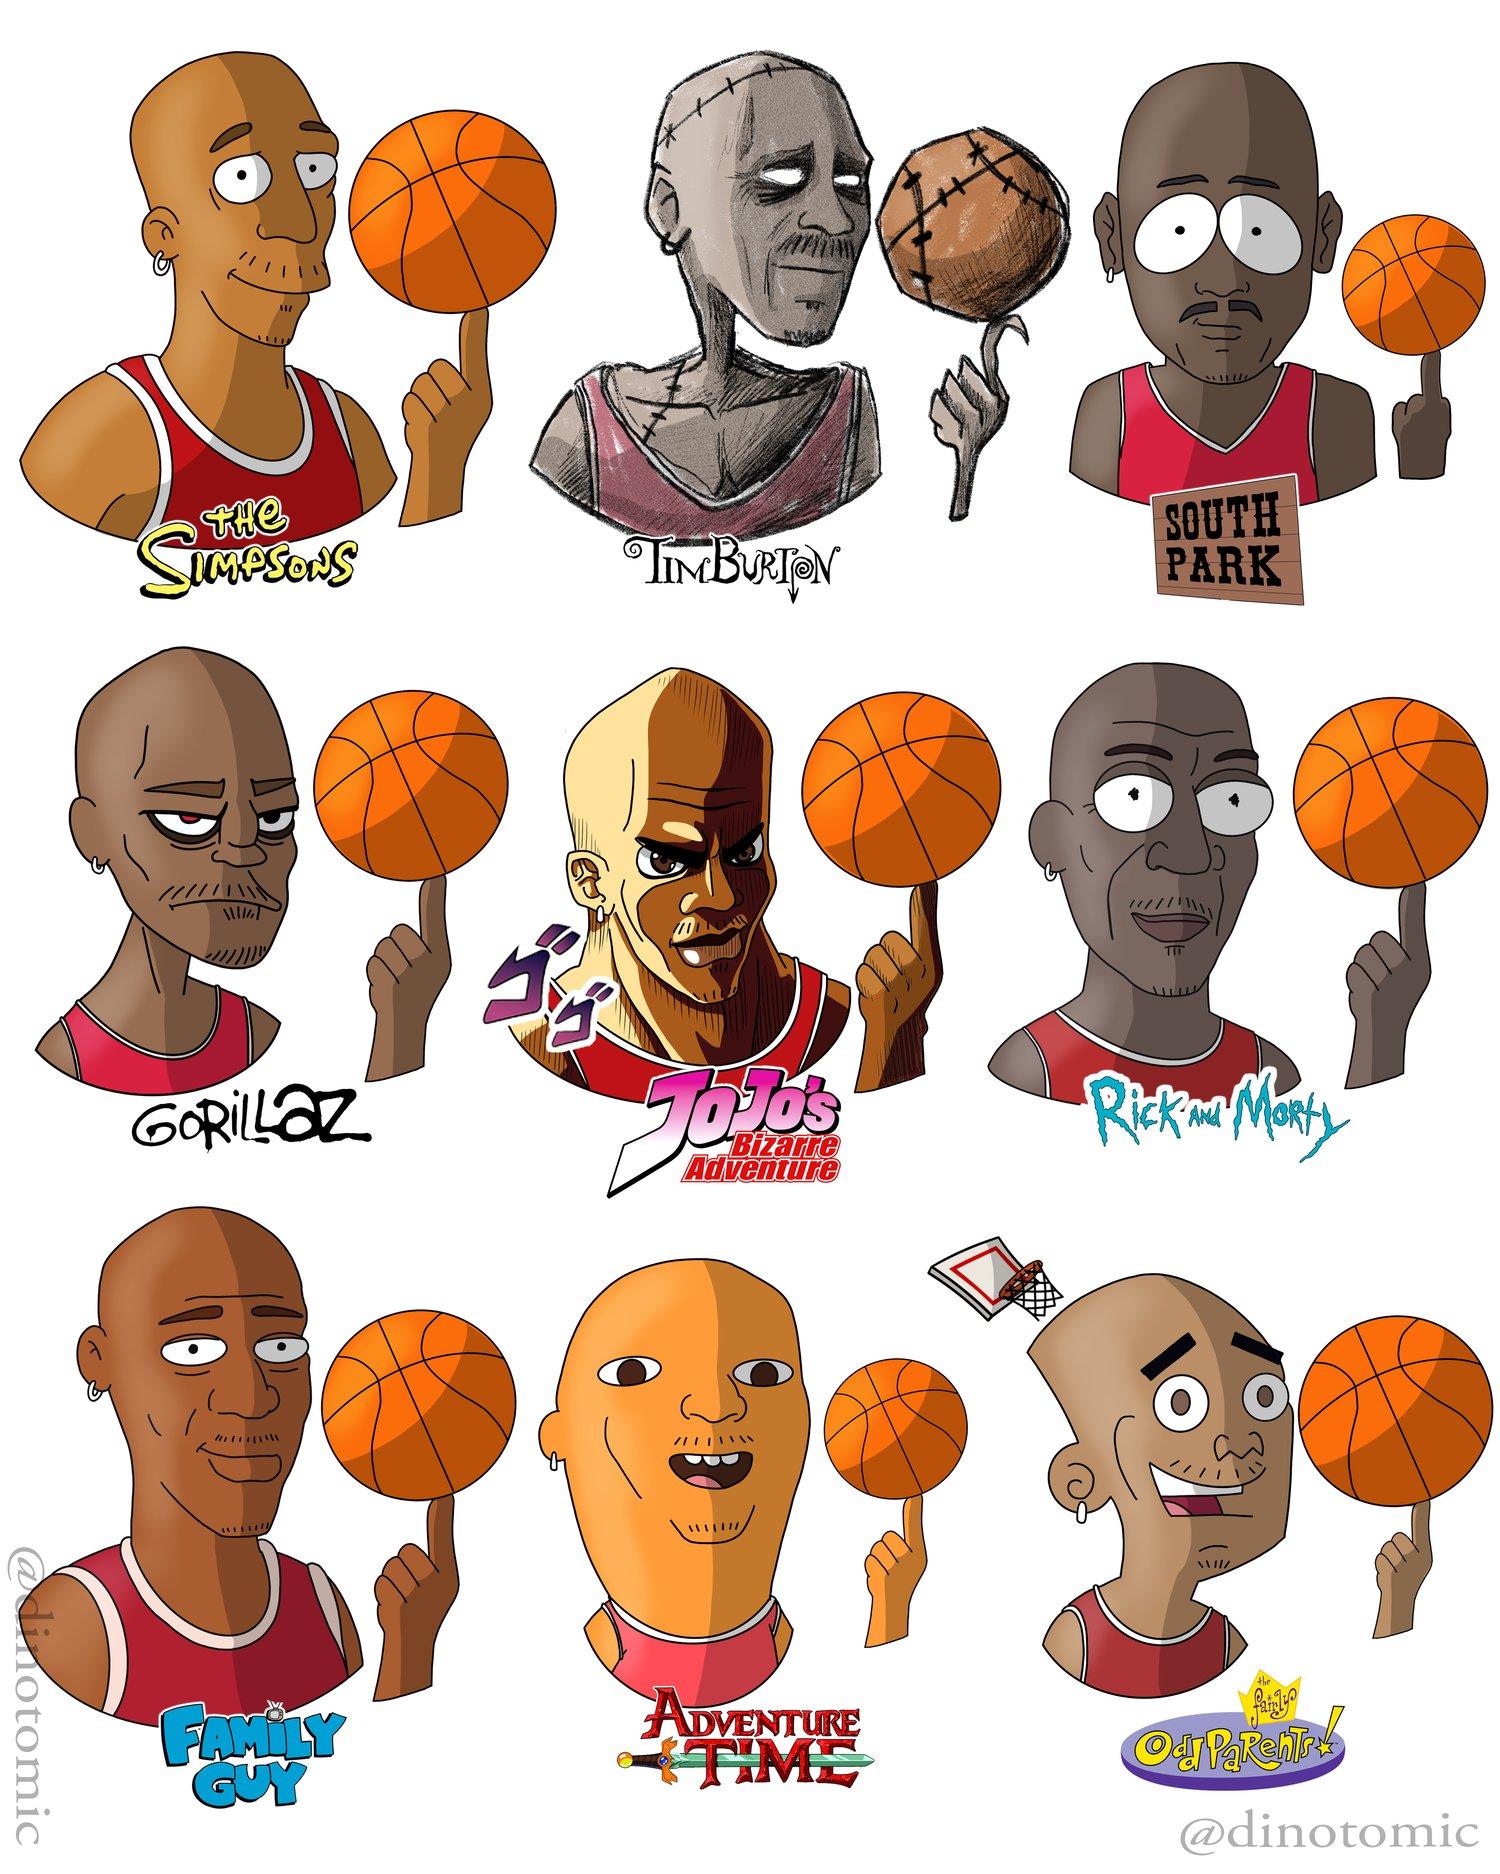 Image of #189 Michael Jordan drawn in many styles